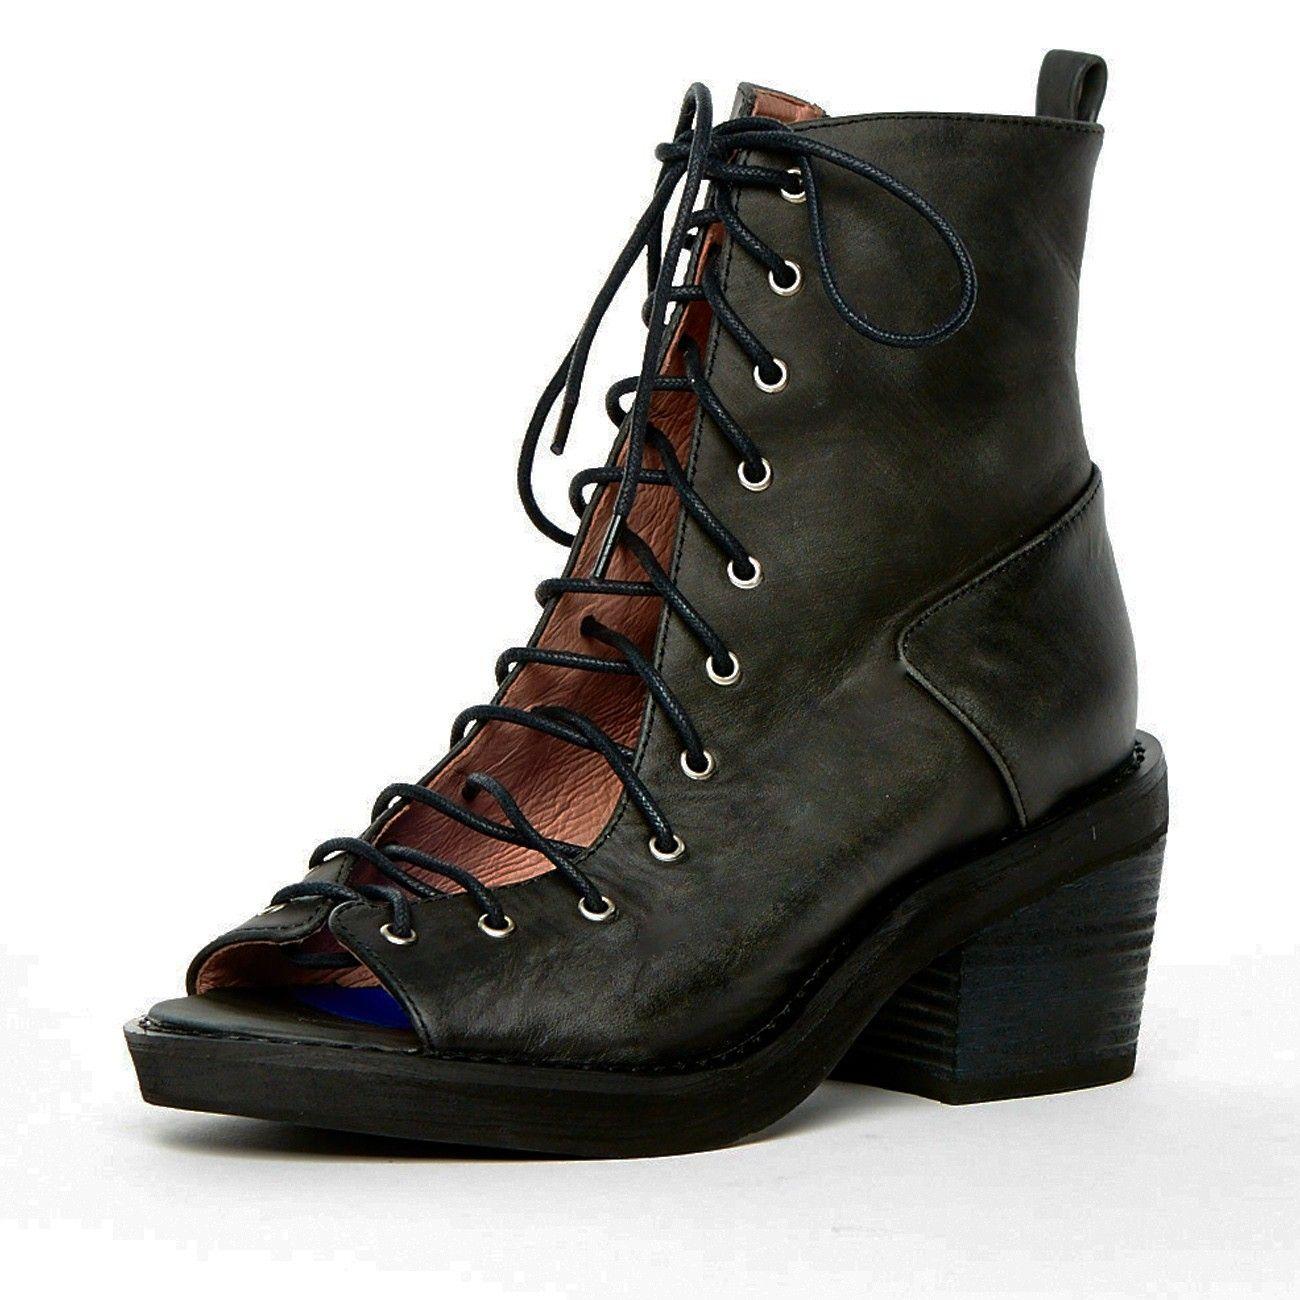 Meriwidow Boots, Leather heels, Shoes